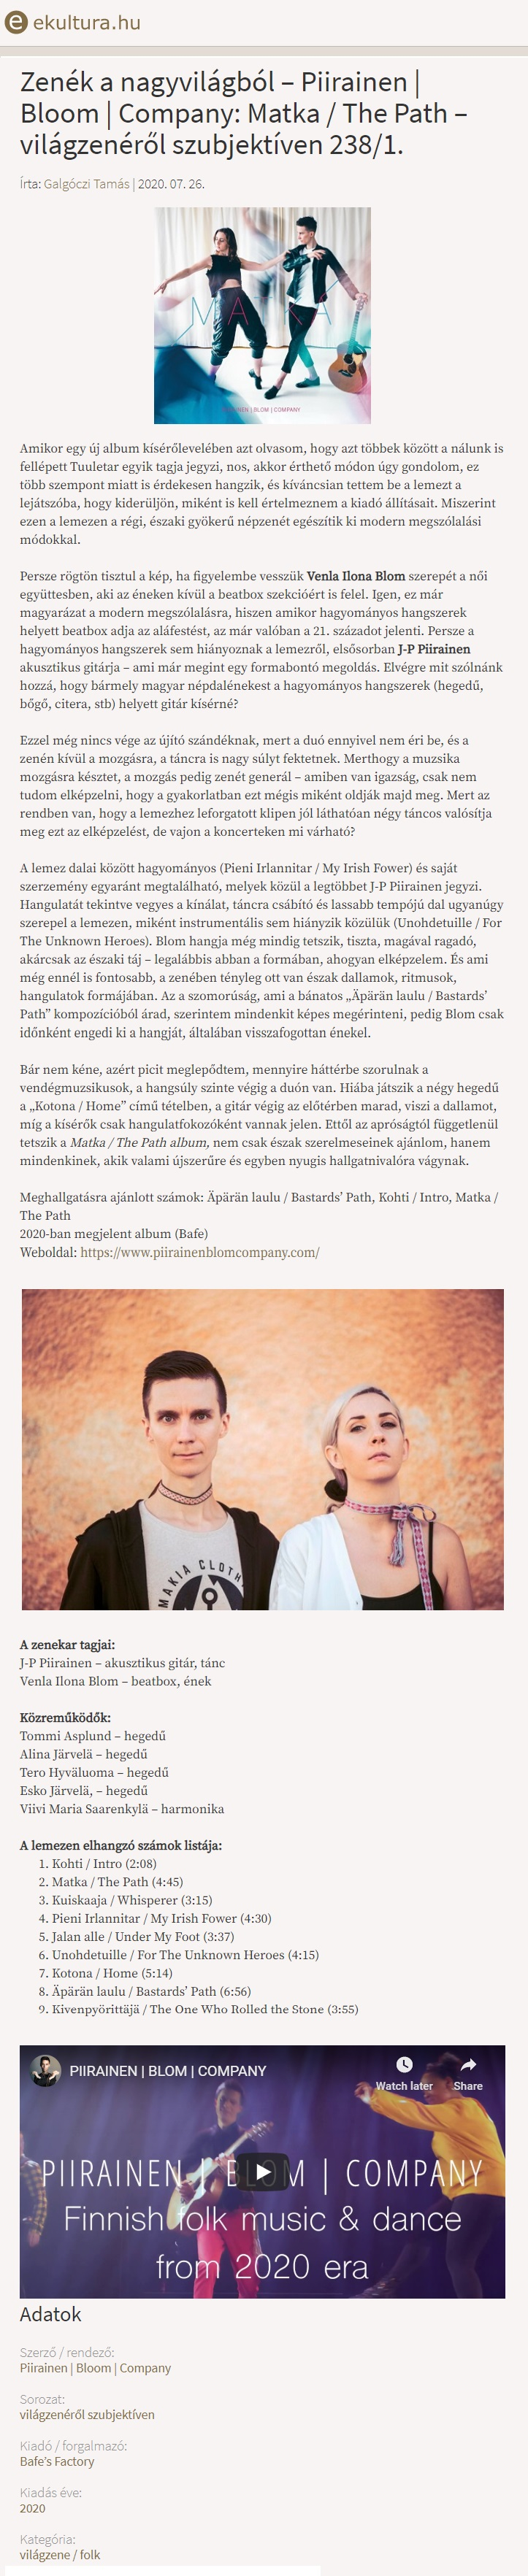 eKultura.hu (Hungary), 26.7.2020